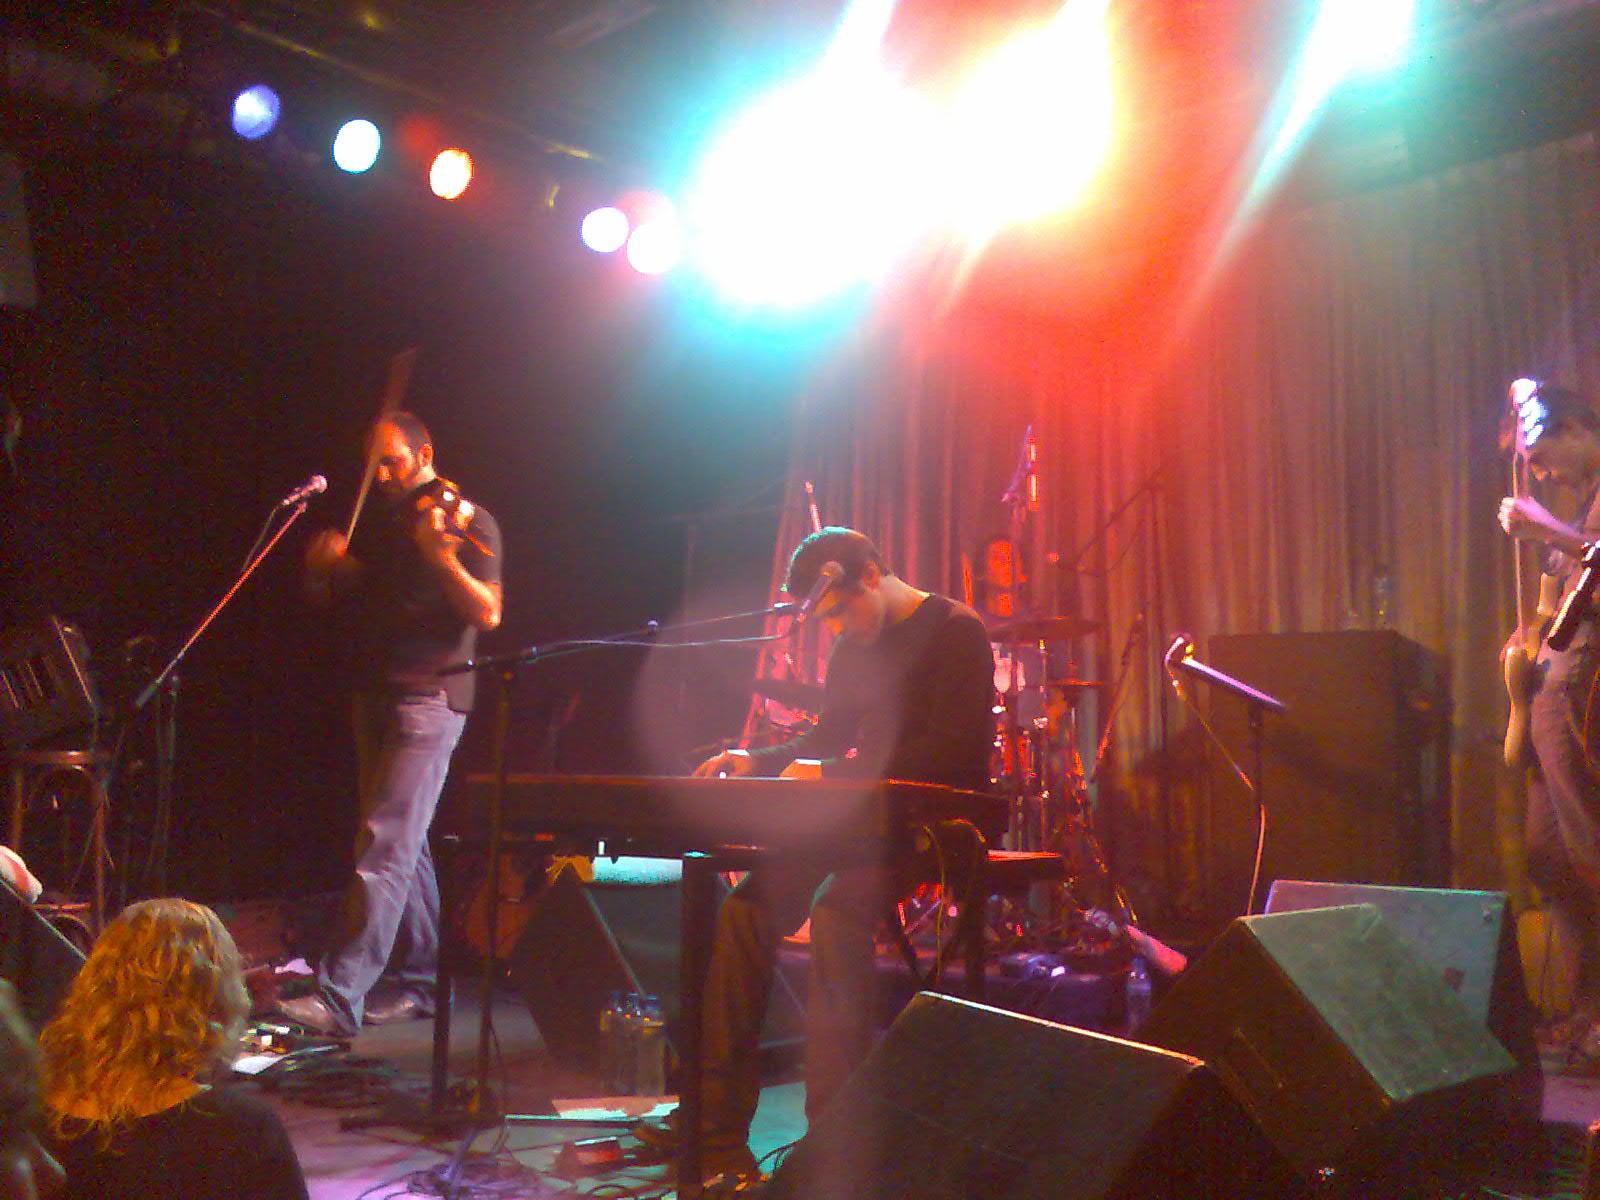 The Rocker - Concerts